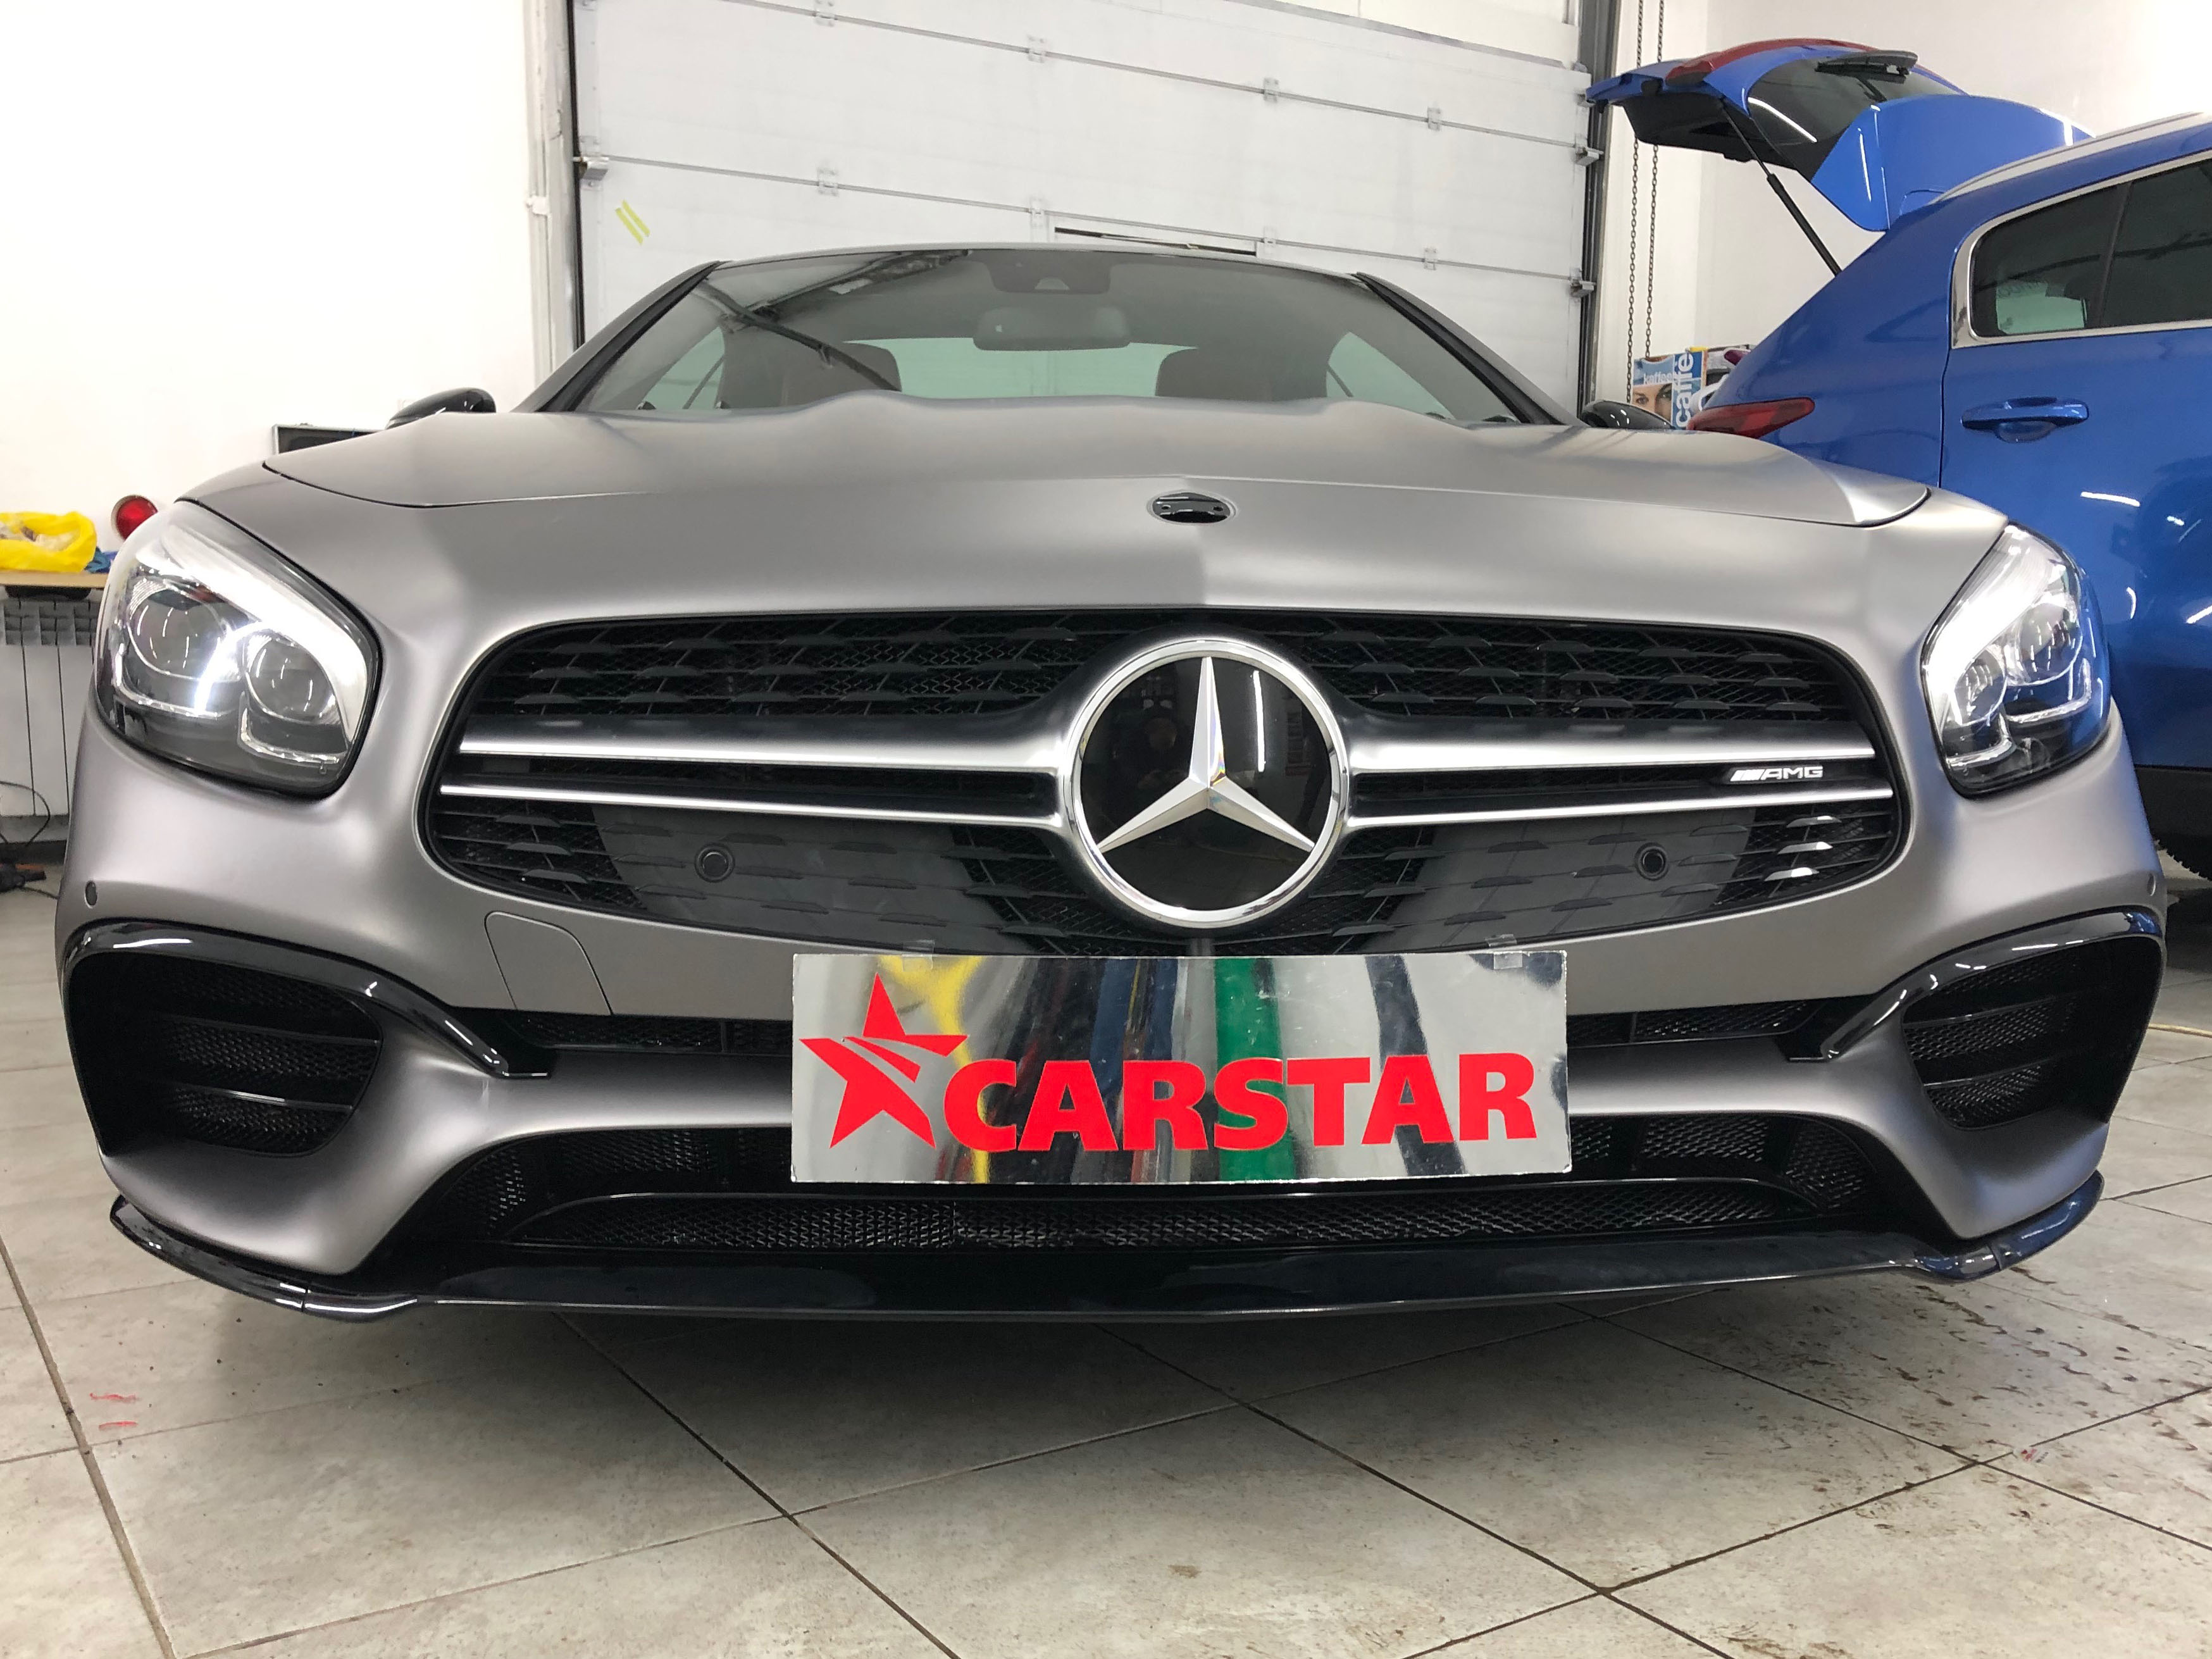 CarStar Wrapping - оклейка авто пленкой